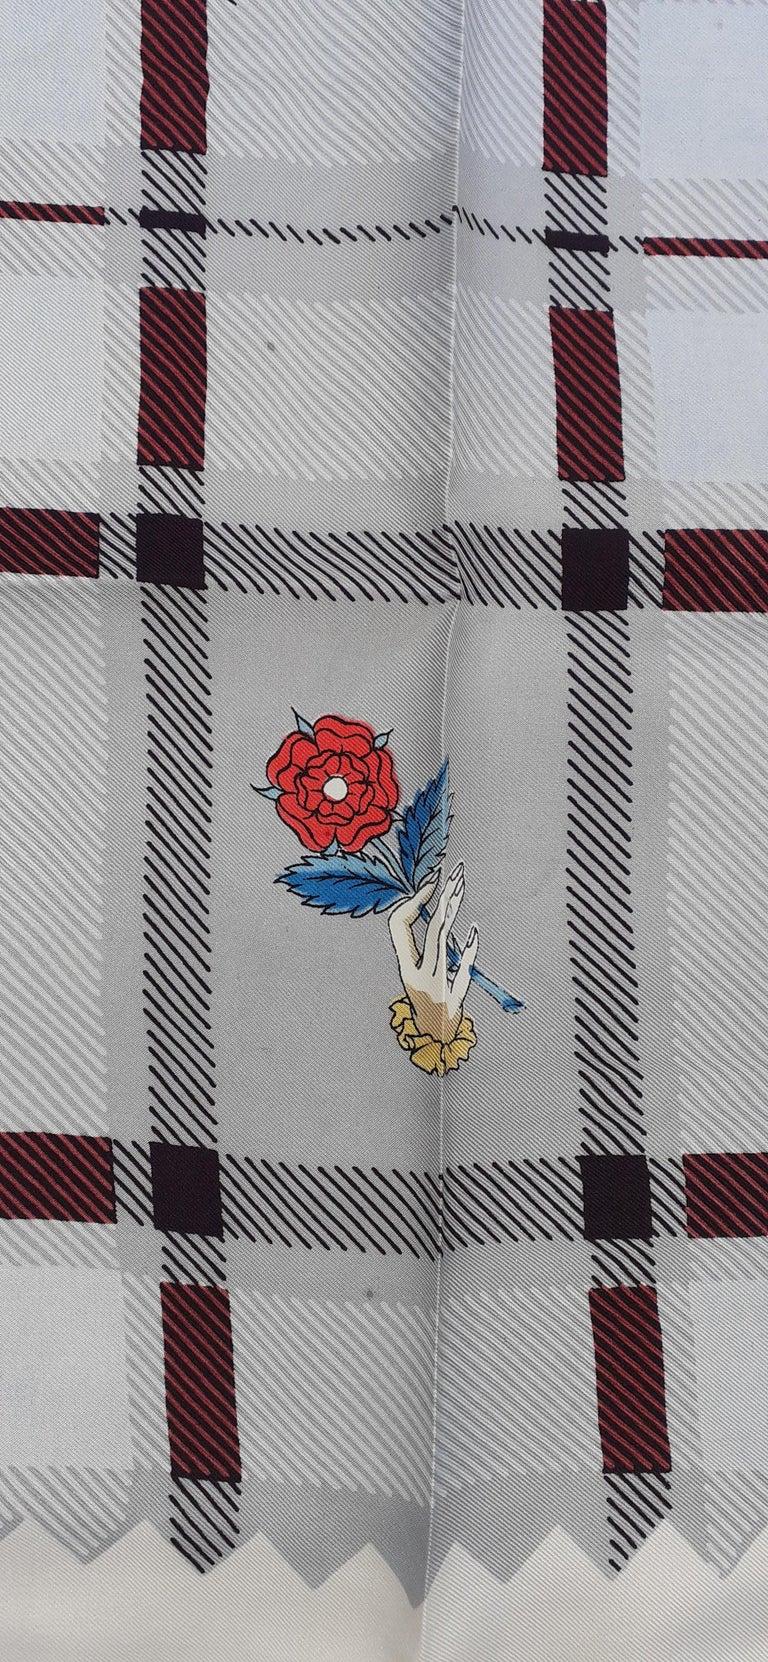 Women's or Men's Hermès Vintage Silk Scarf Bagpipe Cornemuse United Kingdom Grygkar 1951 RARE For Sale